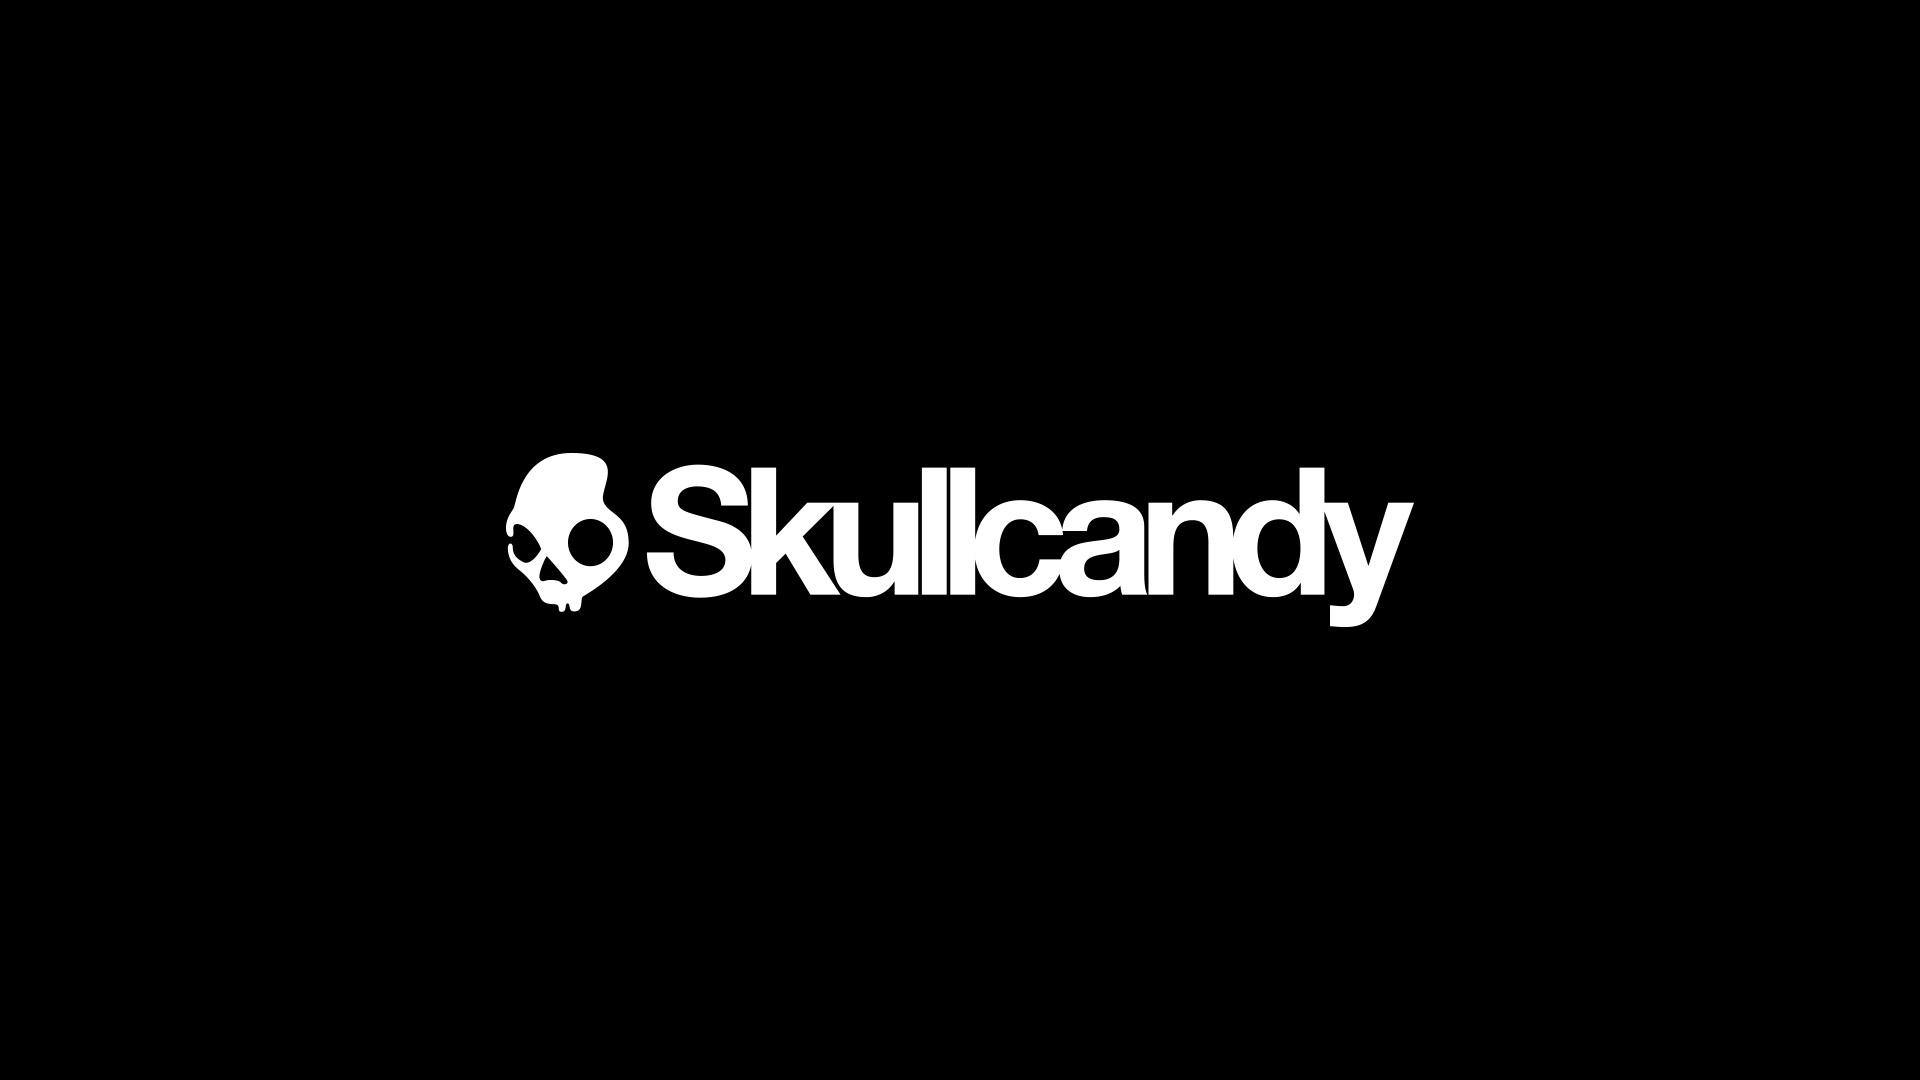 2018_Skullcandy_logo_onblack.jpg